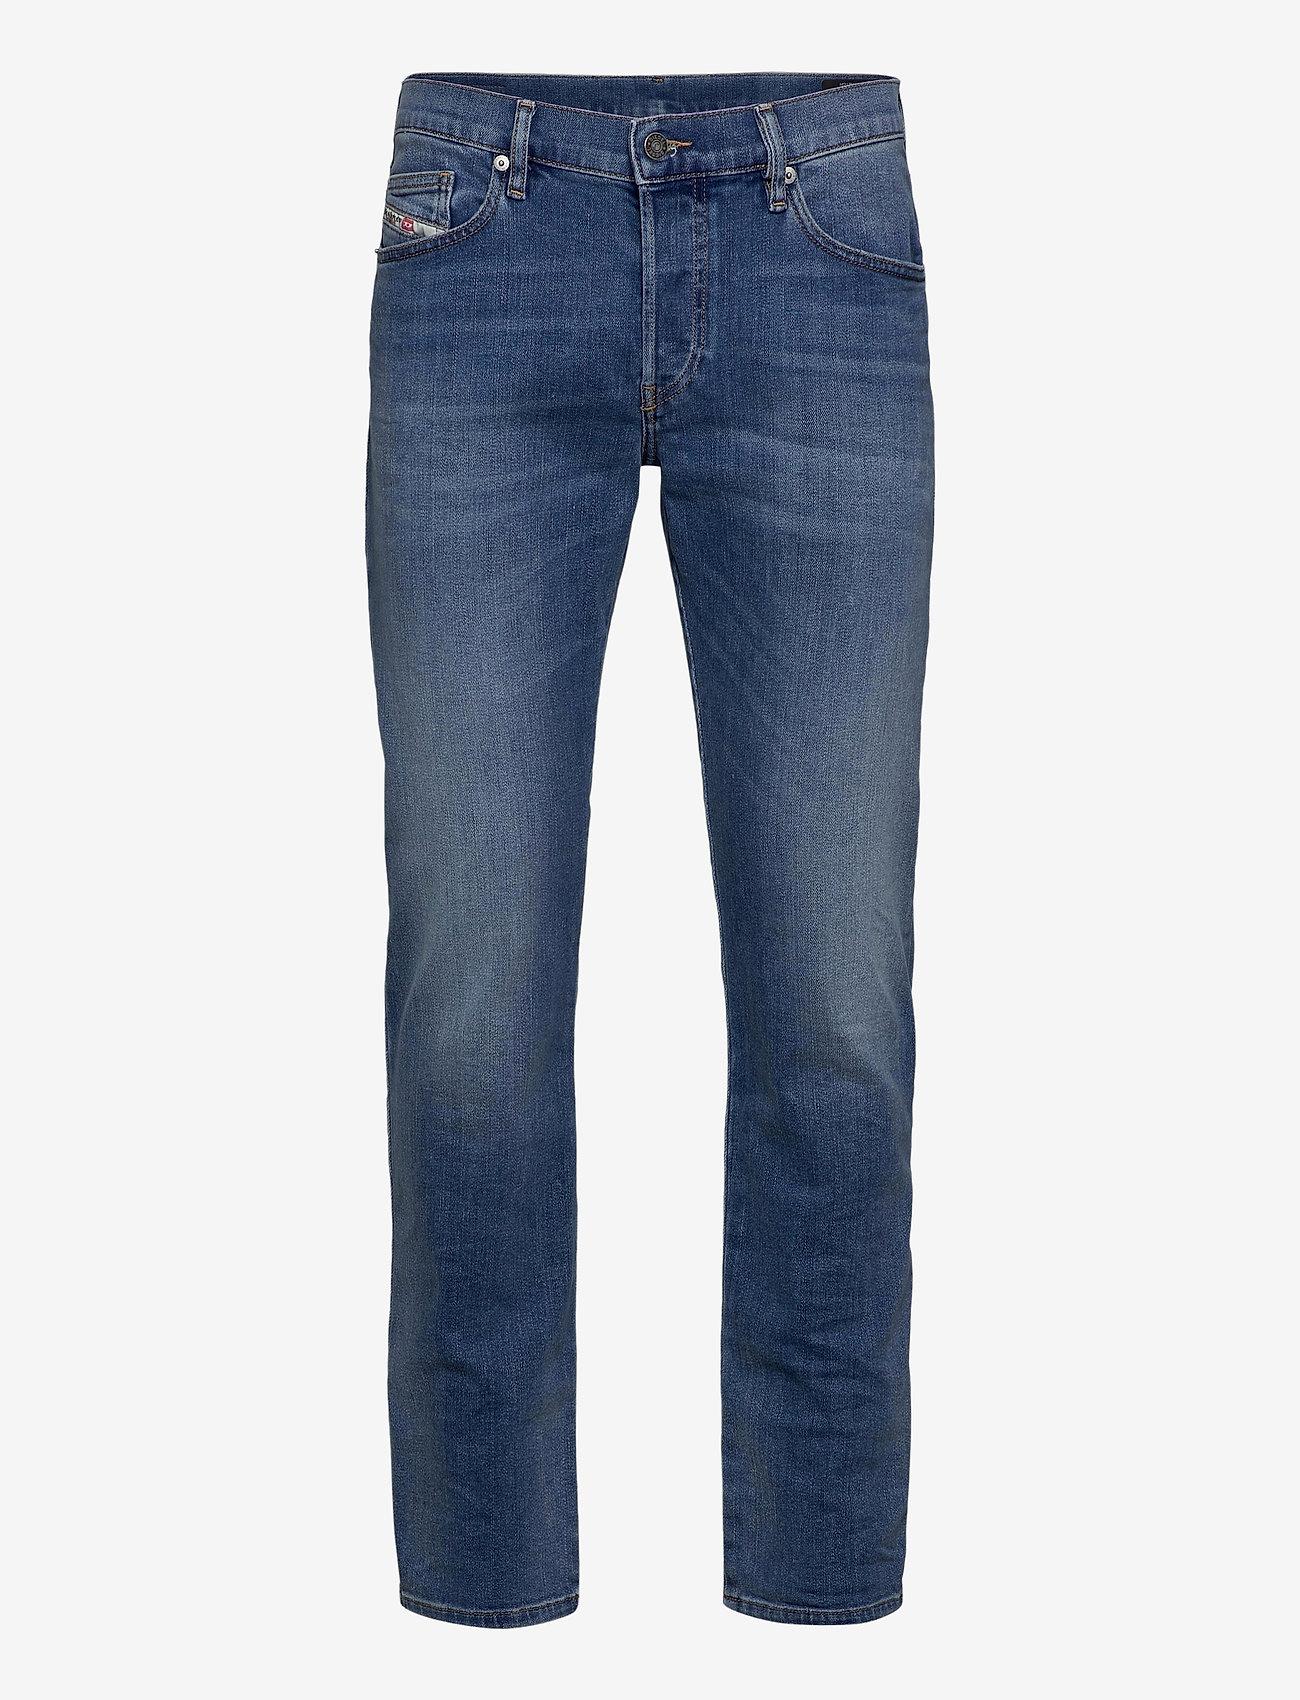 Diesel Men - D-MIHTRY L.30 TROUSERS - regular jeans - denim - 0